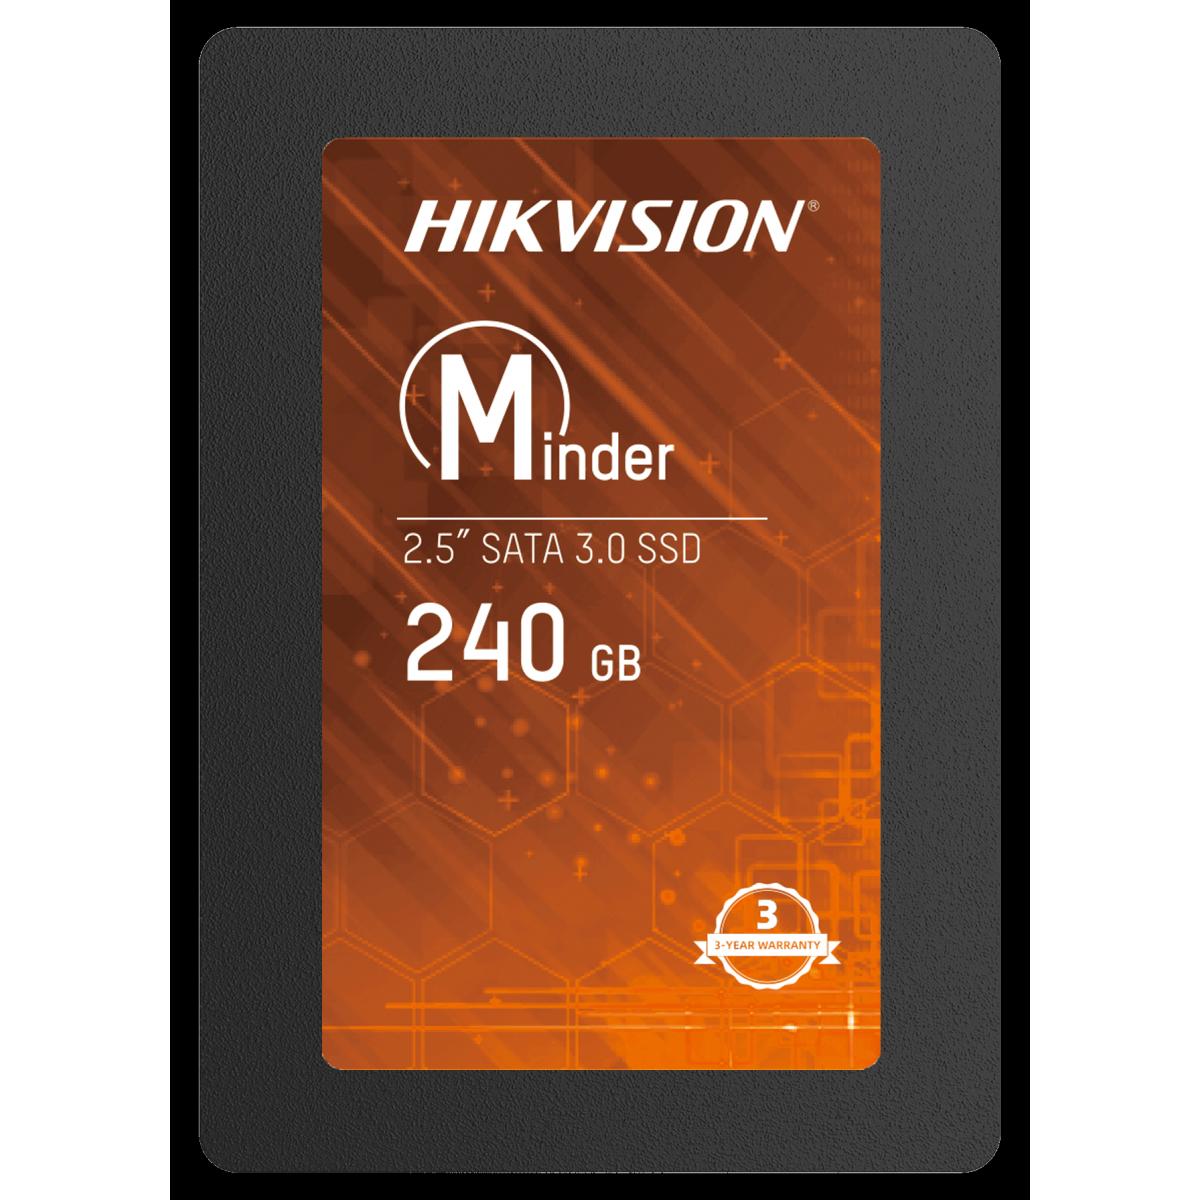 SSD Hikvision Minder, 240GB, Sata III, Leitura 530MBs e Gravação 400MBs, HS-SSD-Minder(S)/240G